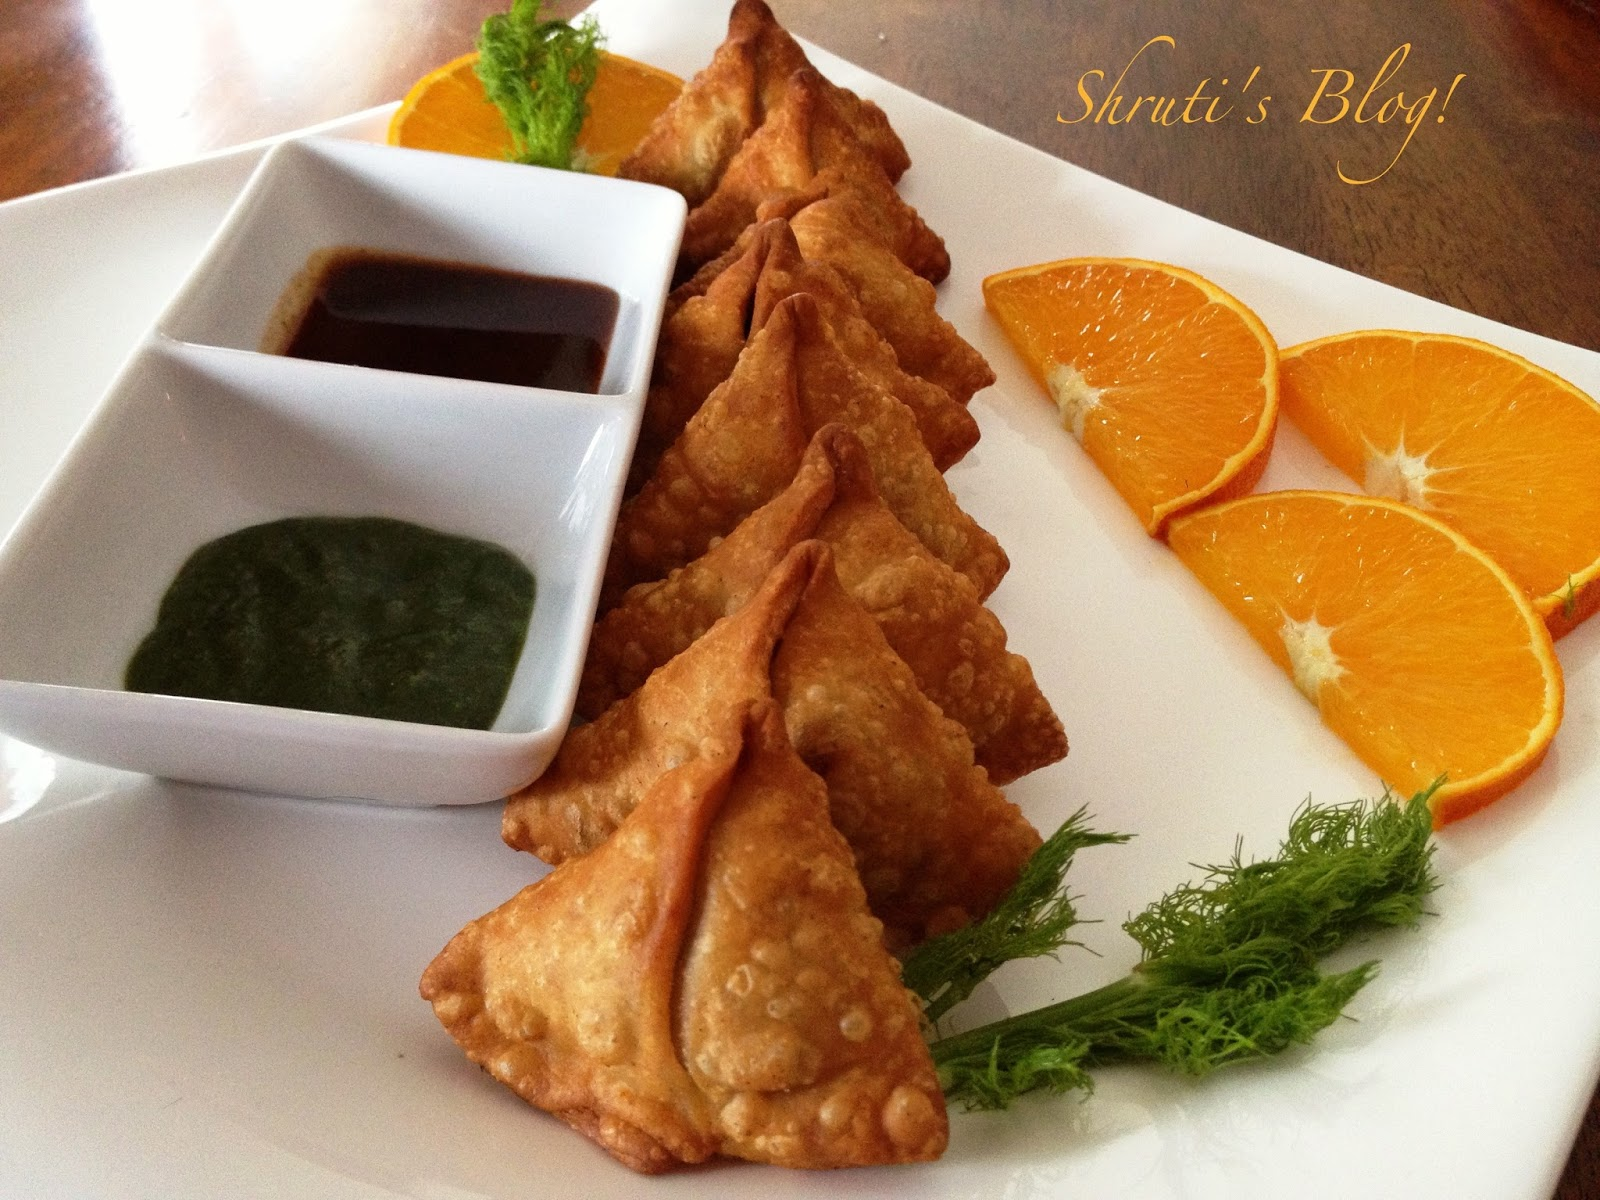 Shruti's Blog: Swatantrata Samosa